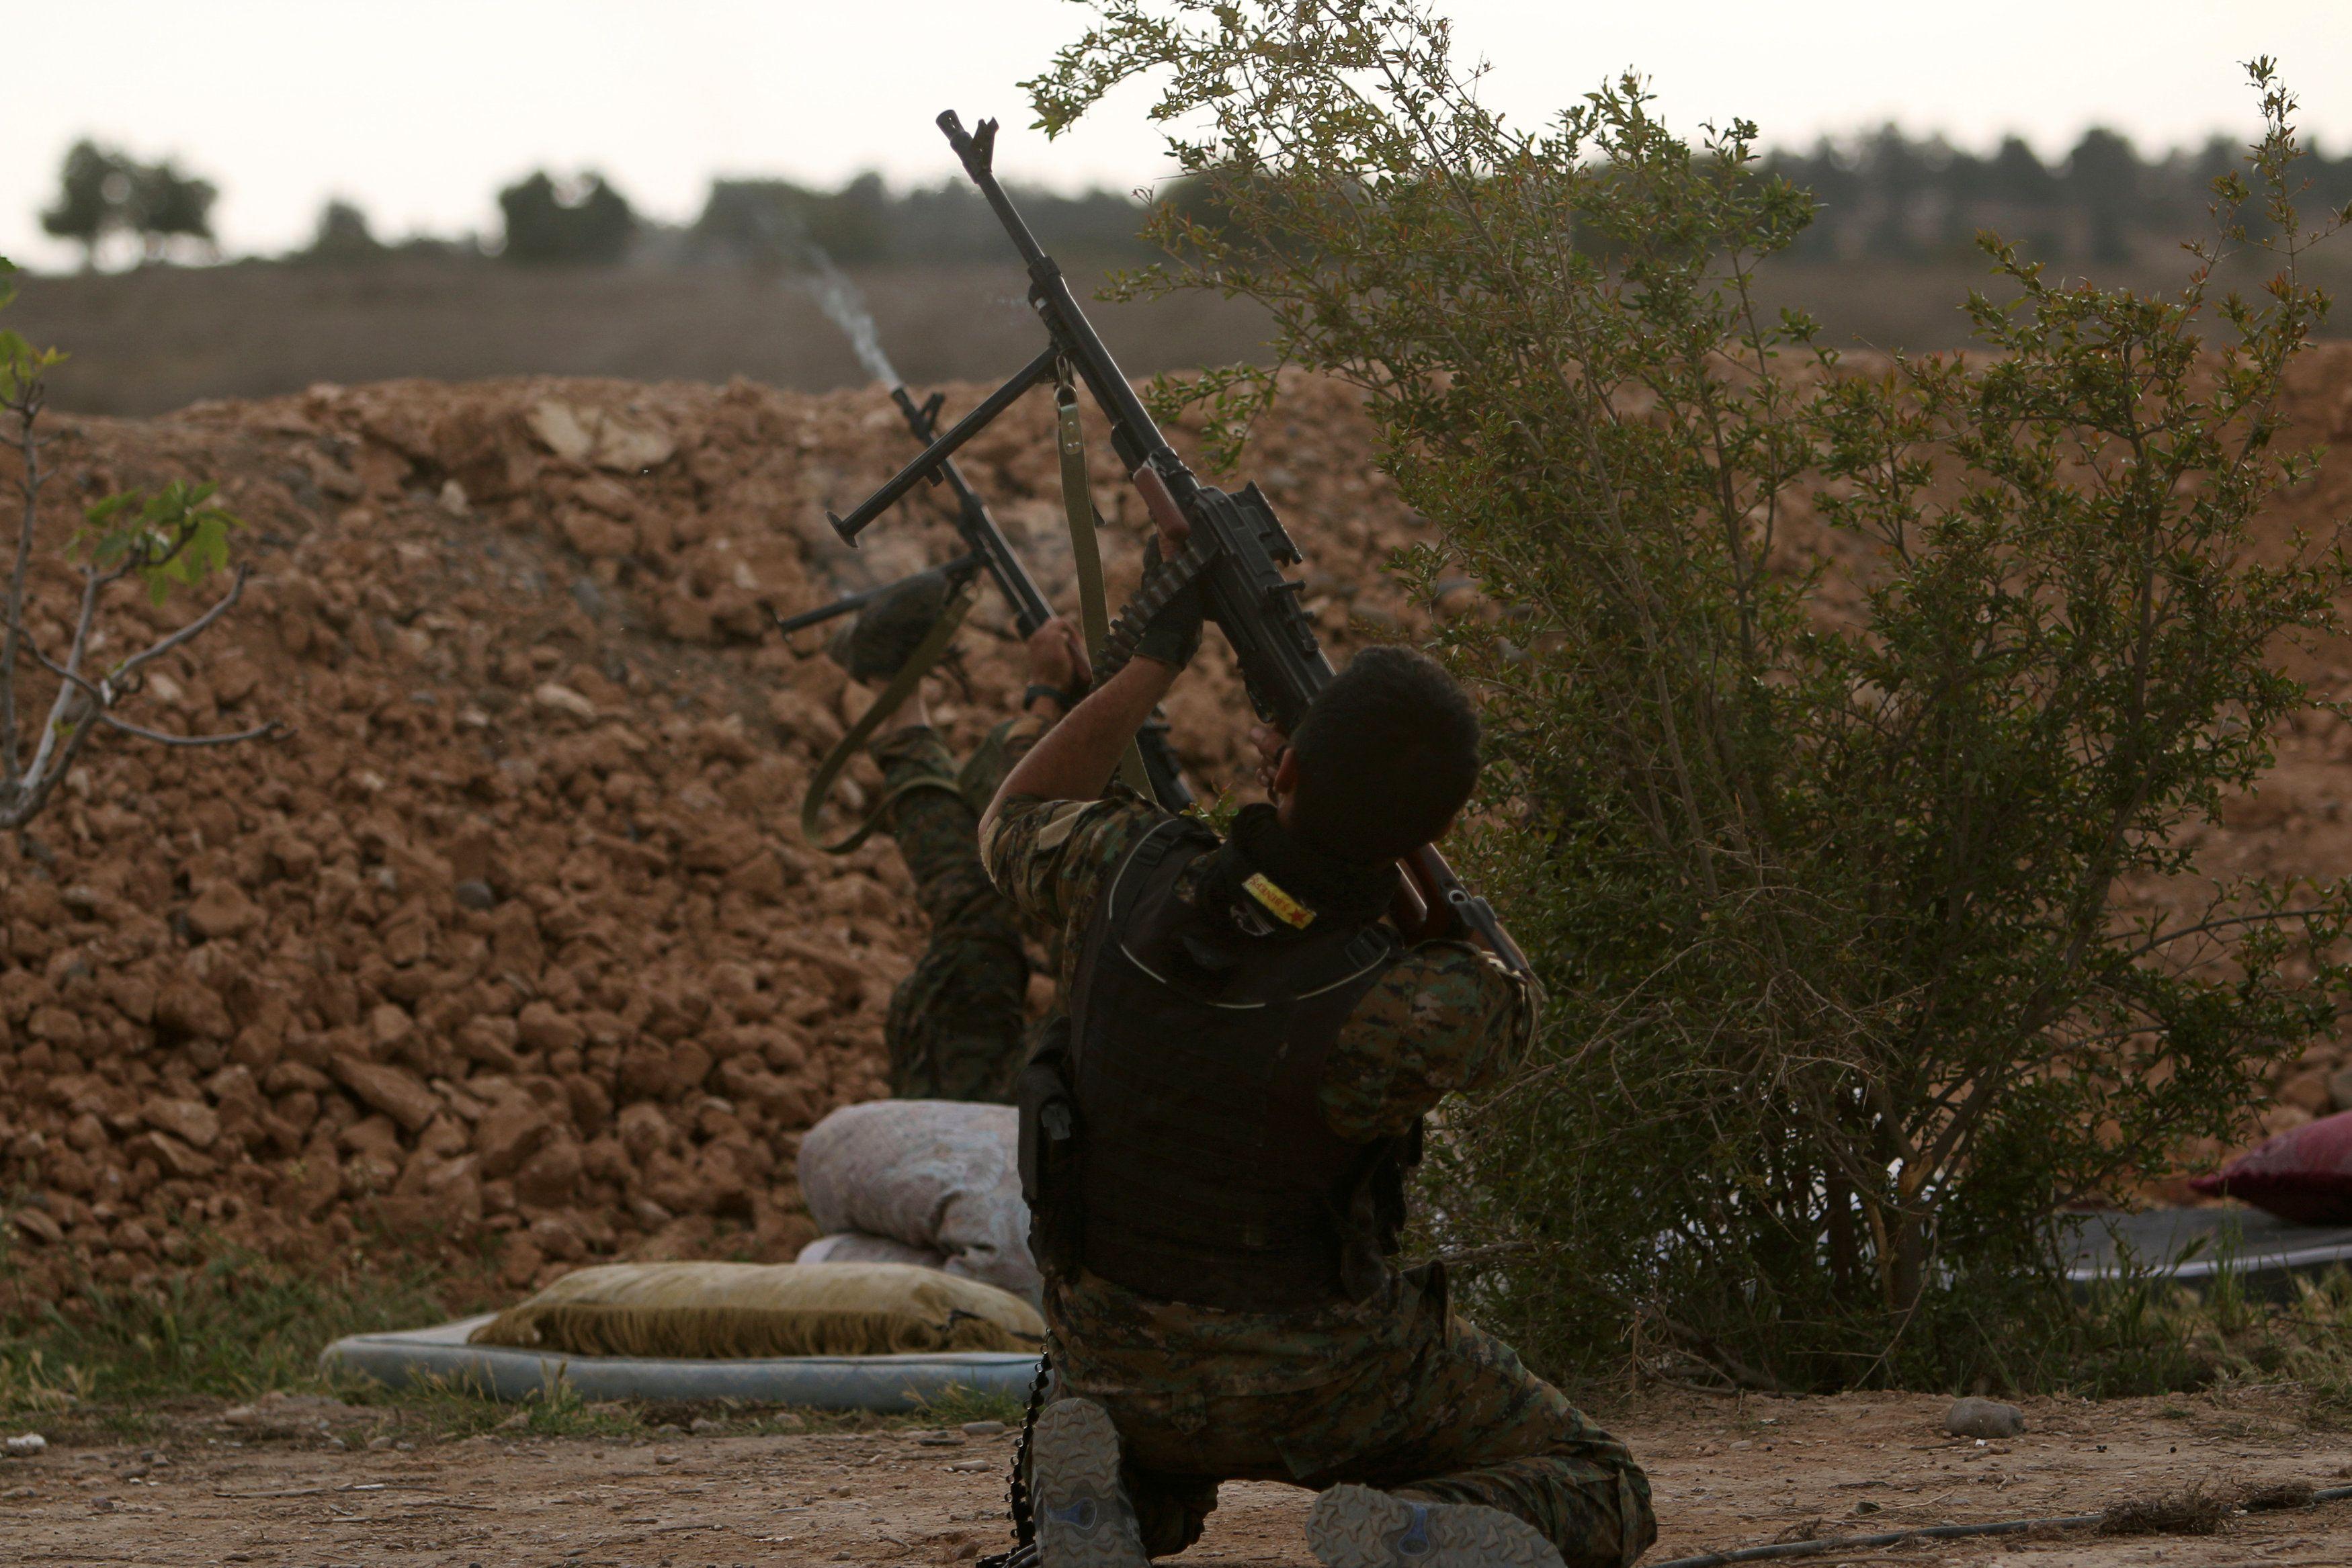 Estado Islâmico ataca base norte-americana na Síria